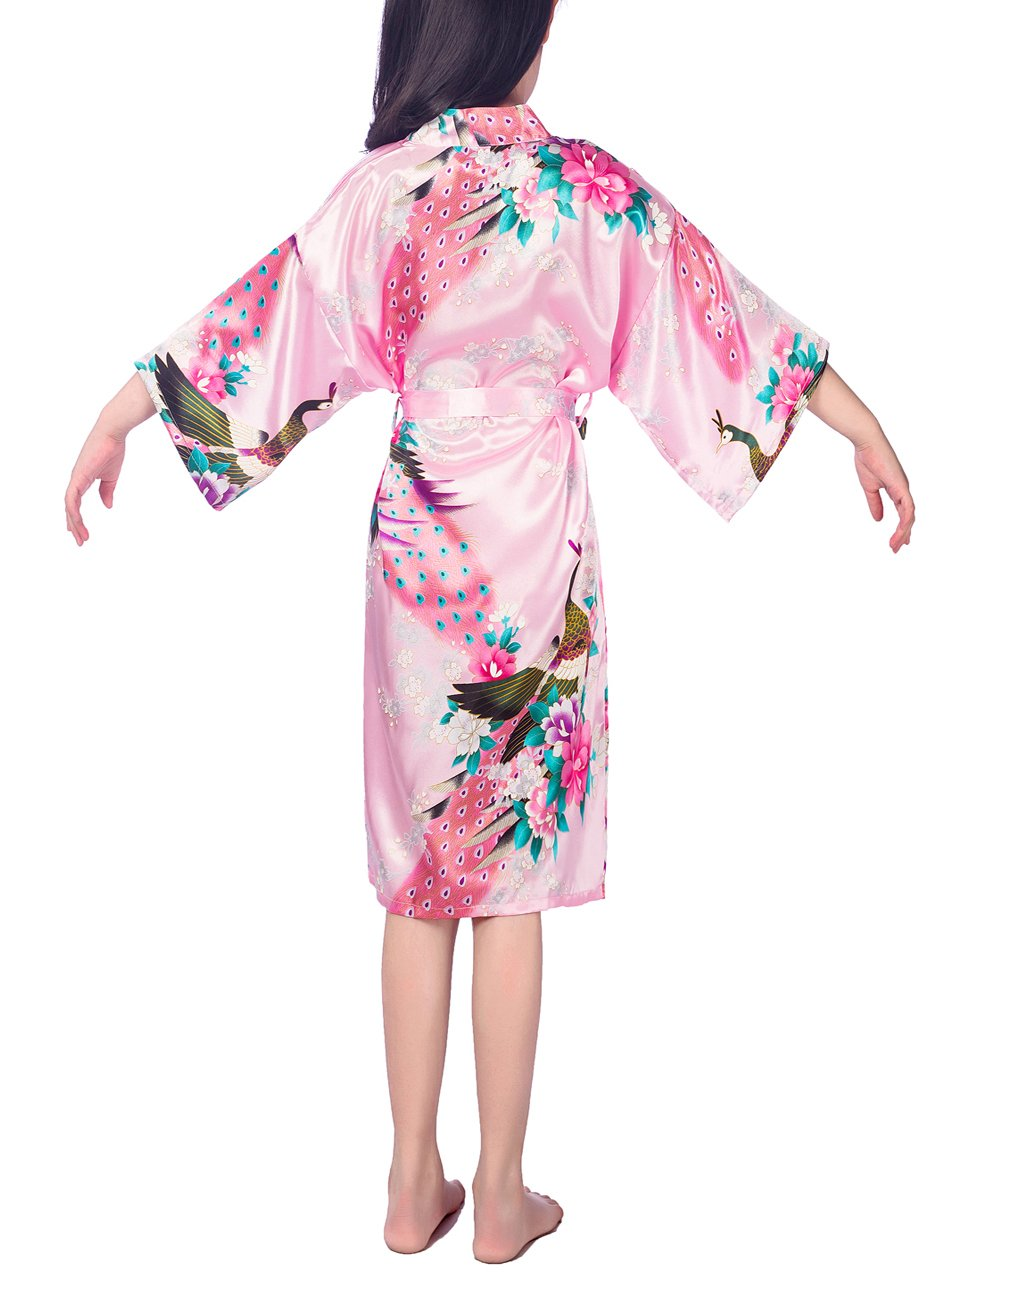 4# , White Defal Kids Children Girls Satin Peacock Flower Kimono Robe Cute Bathrobe Sleepwear for Spa Party Wedding Birthday Height 31.5-35.5 inch//2-3 years